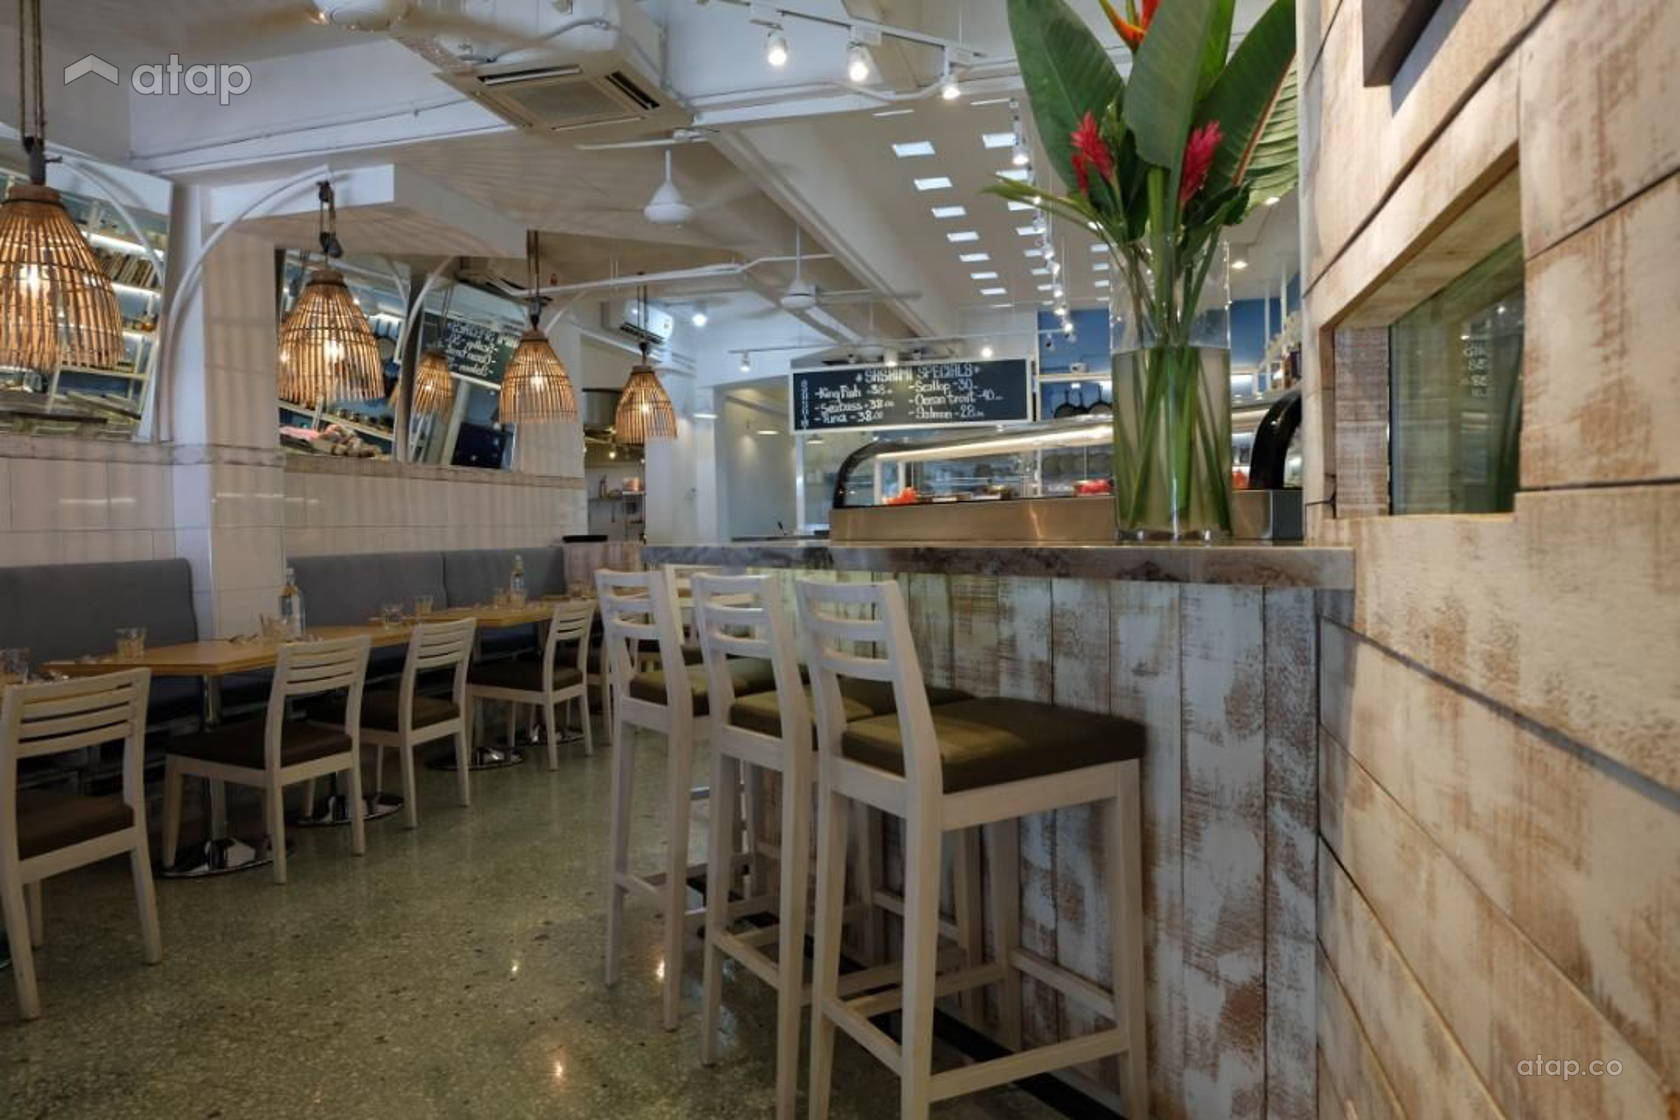 southern rock seafood restaurant expansion interior design 1 19